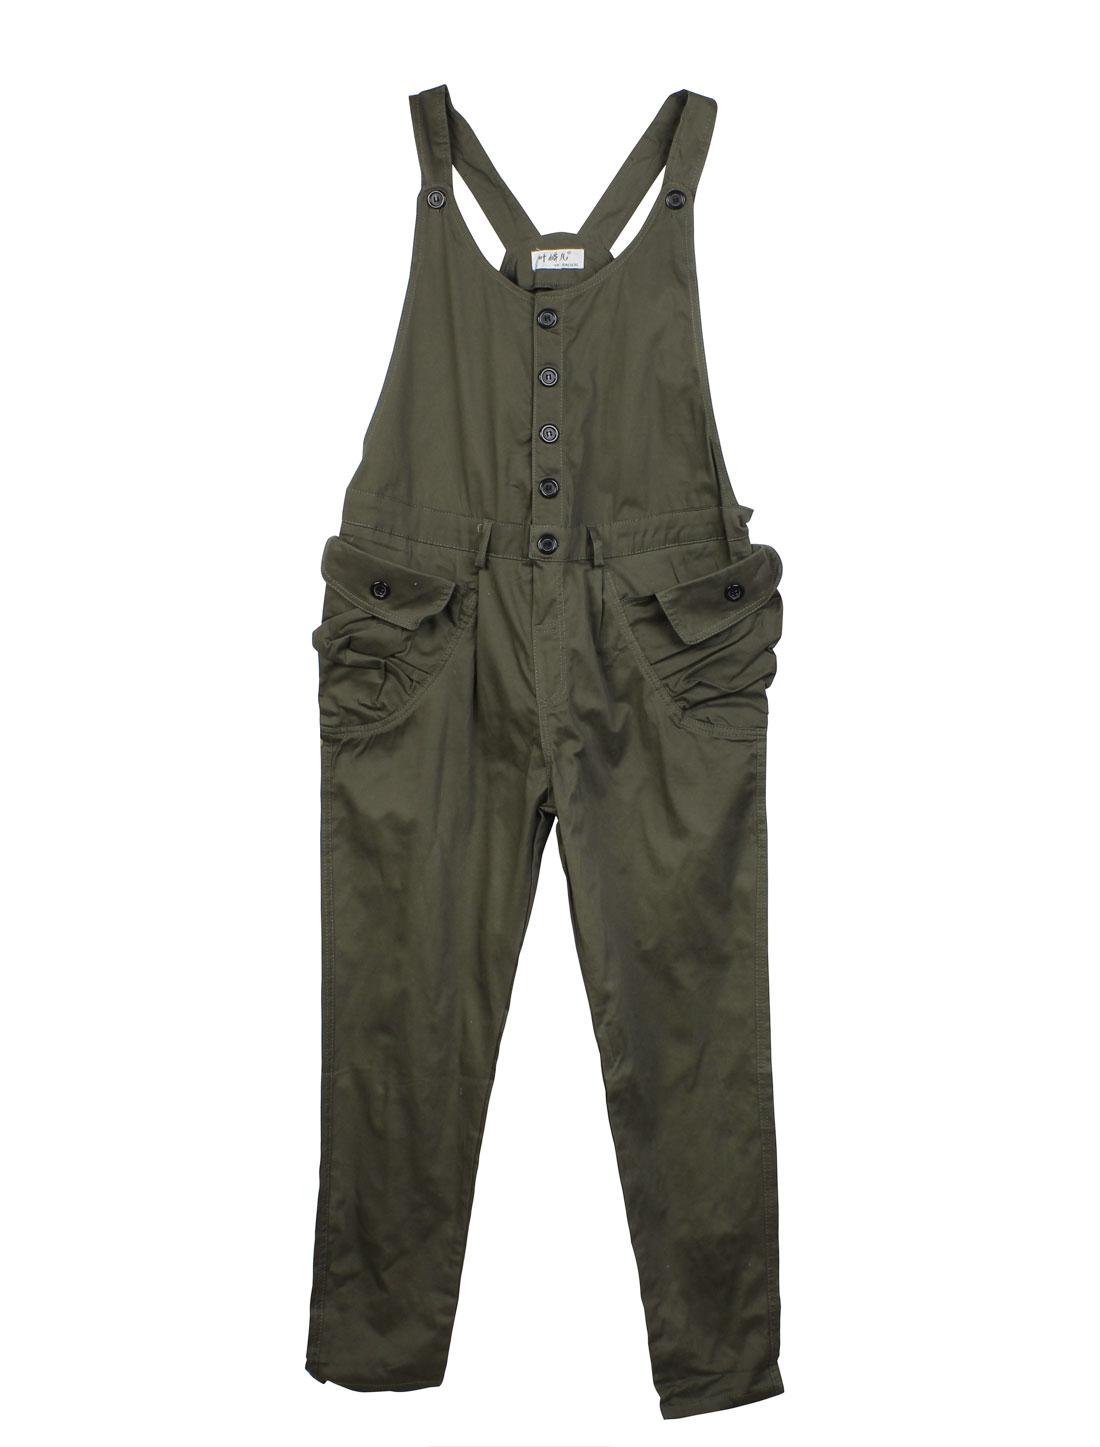 Olive Green L Button Closure Belt Loops Patch Pockets Motherhood Suspender